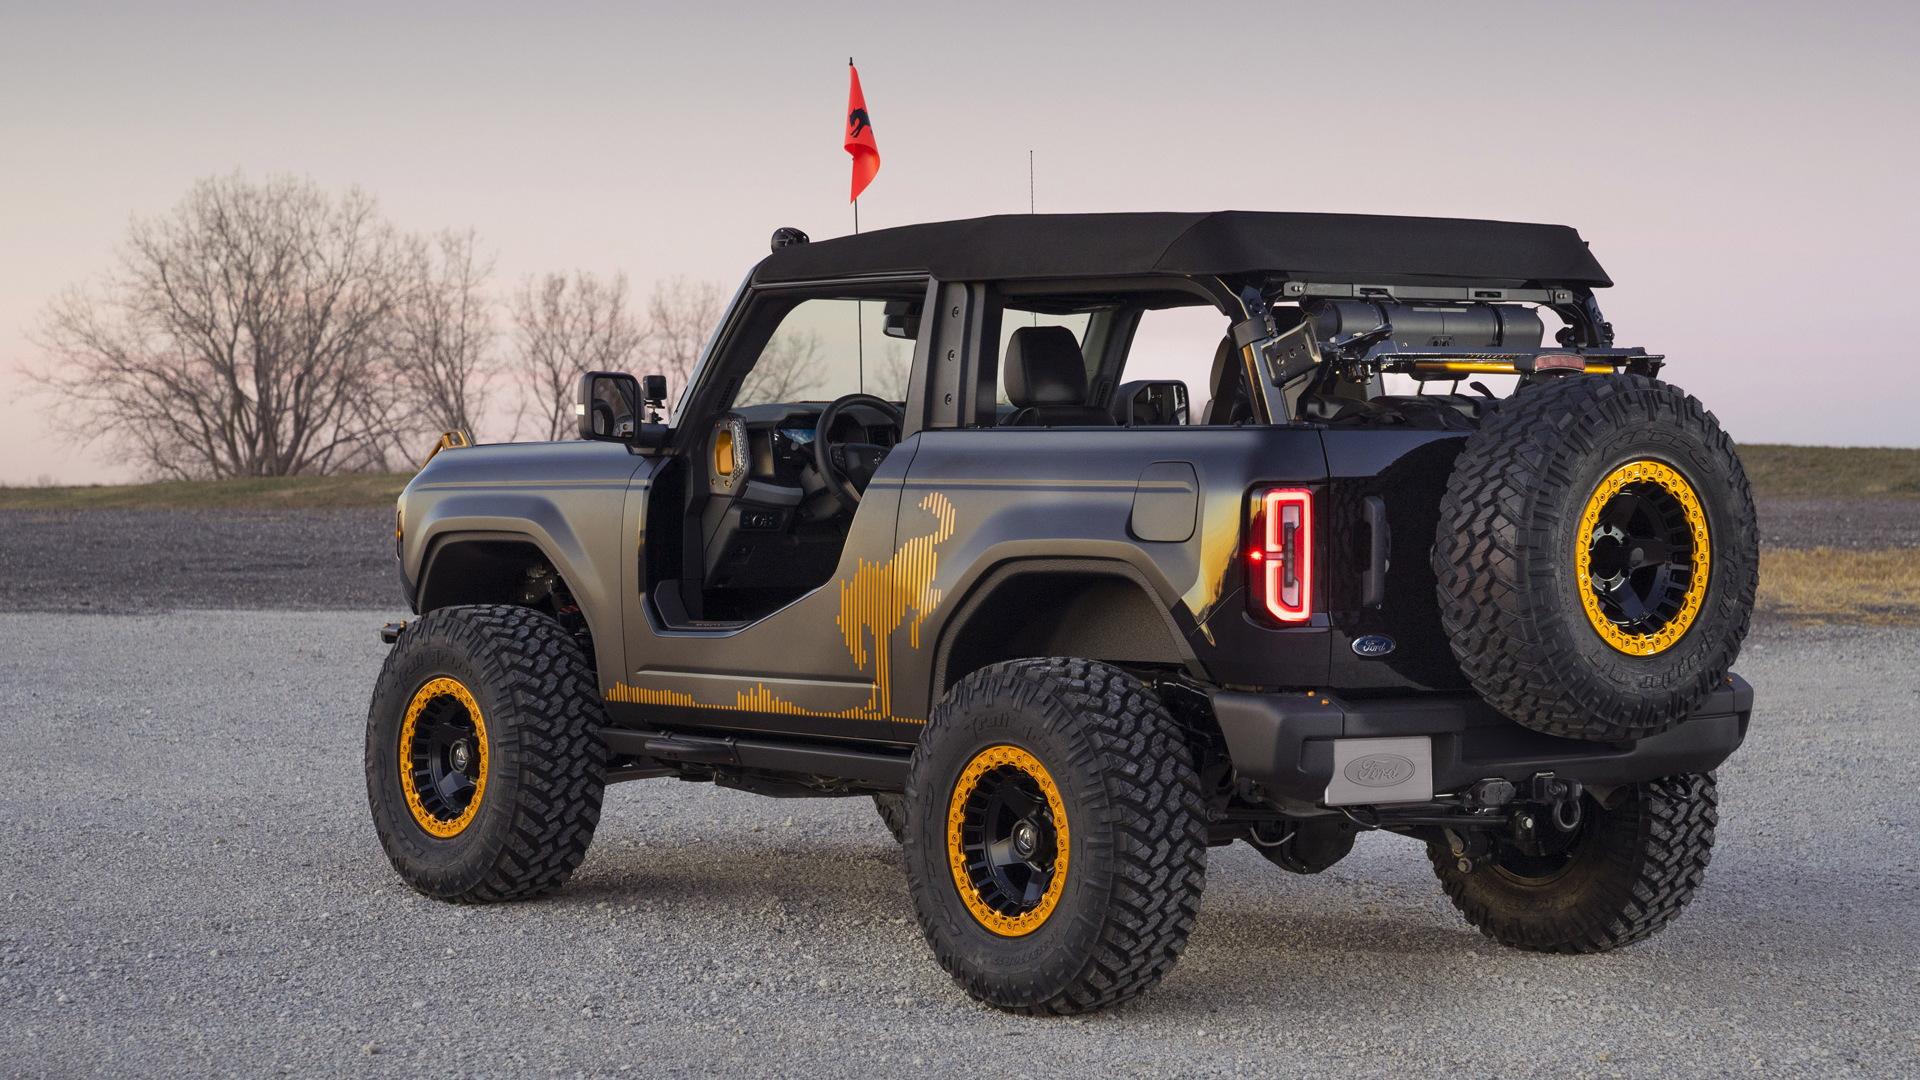 Ford Bronco Badlands Sasquatch 2-Door Concept